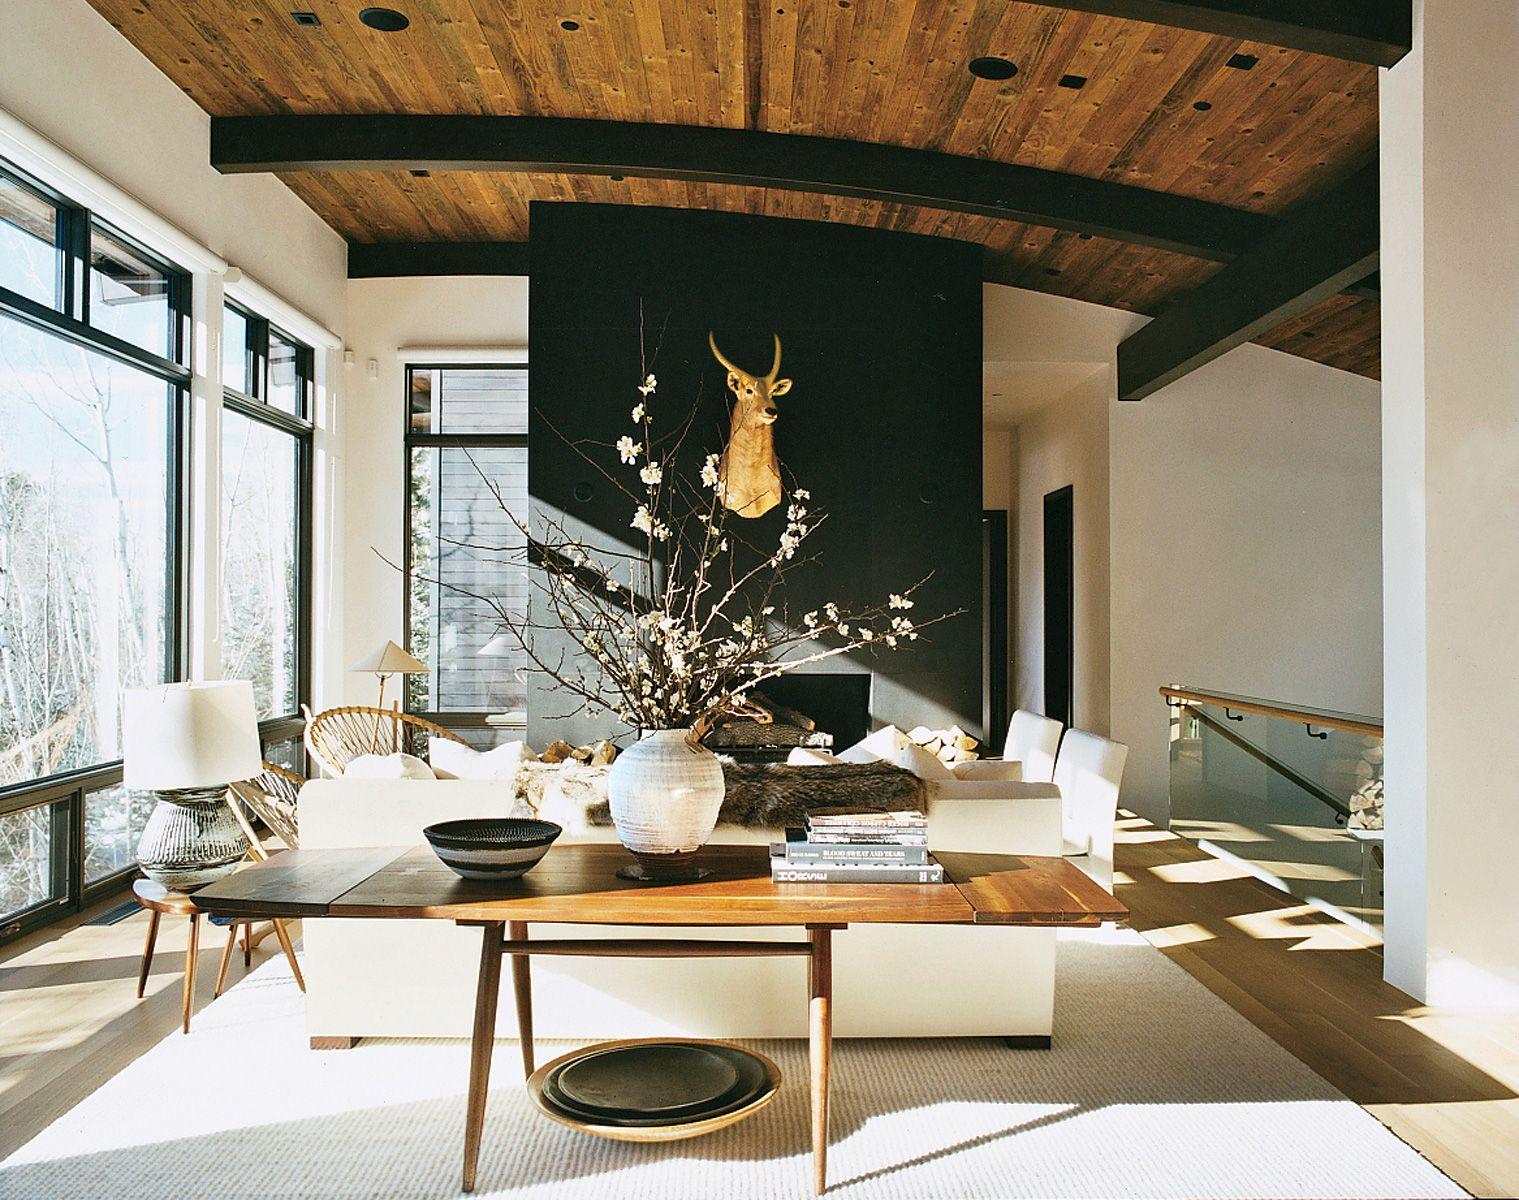 Aerin Lauder Home  Un Coup D'aile Aerin Lauder's Aspen Home Extraordinary Aspen Home Dining Room Furniture Decorating Design